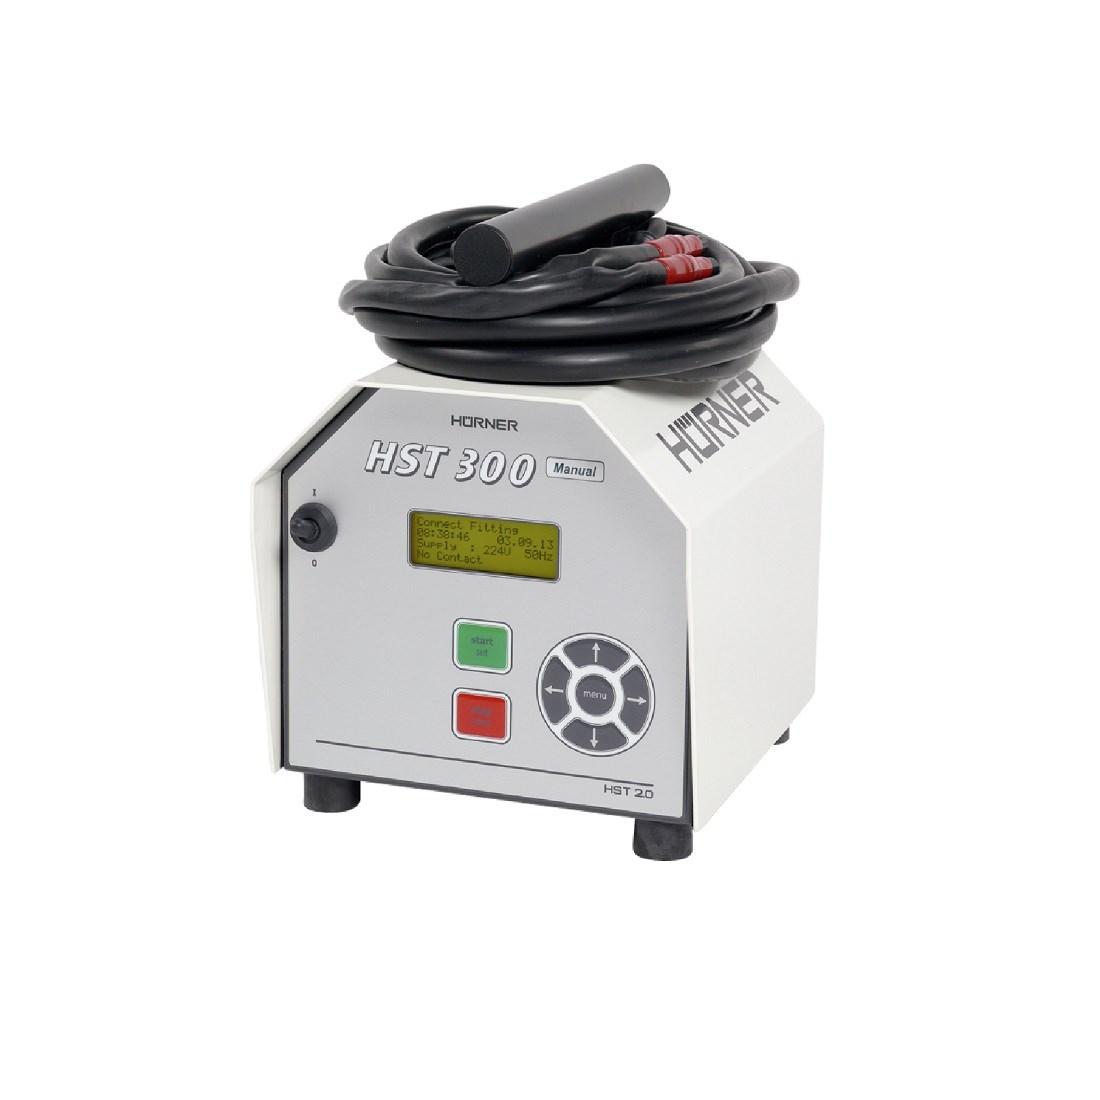 Hurner Elektrolastrafo HST300 manual 200-230-004